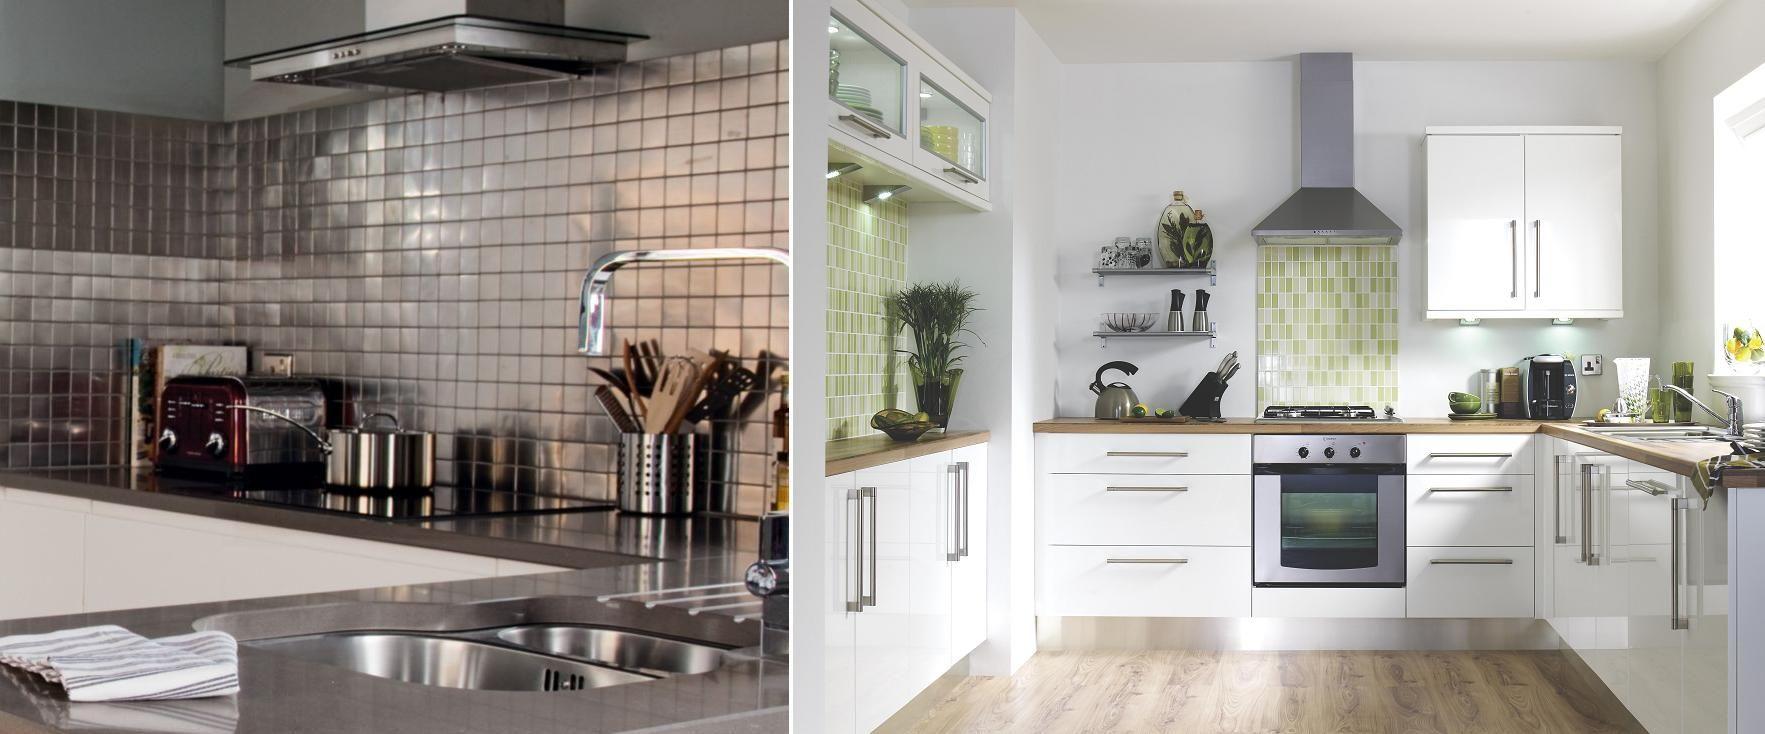 Kitchen Tiles Ideas For Splashbacks Part - 25: Tiled Backsplash Only - Kitchen Tile Style